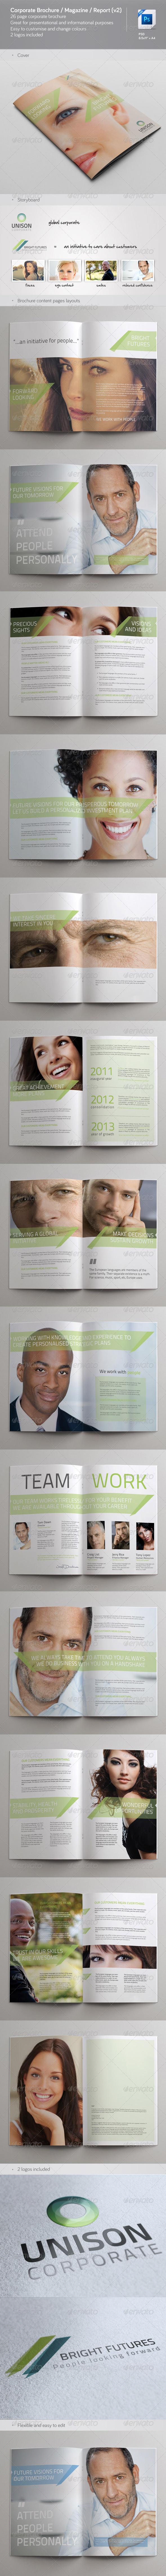 GraphicRiver Corporate Brochure Magazine Report v2 3848898